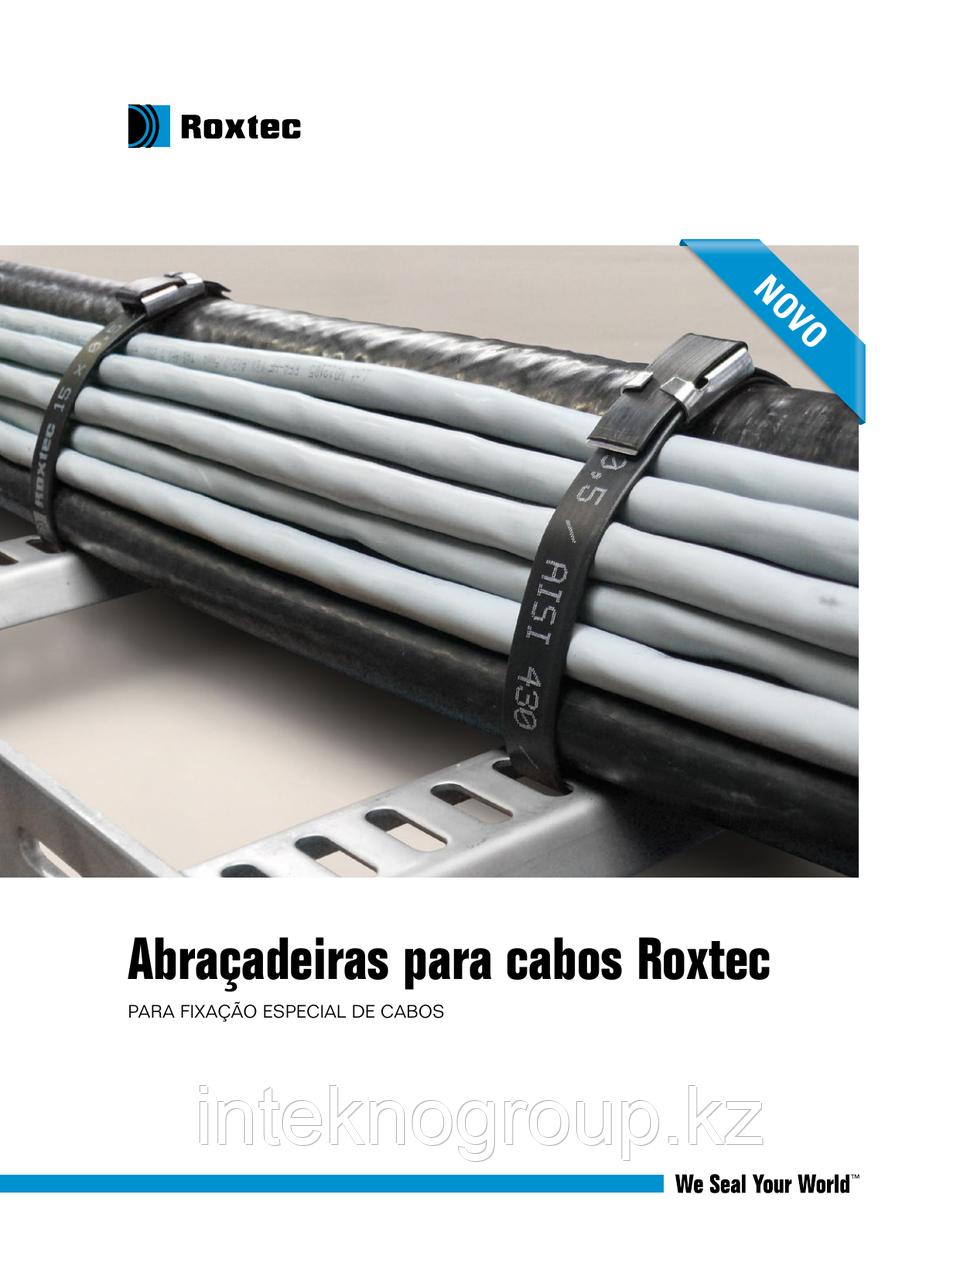 Roxtec Cable straps Strap 15x0,5 black/ss. L=800 mm